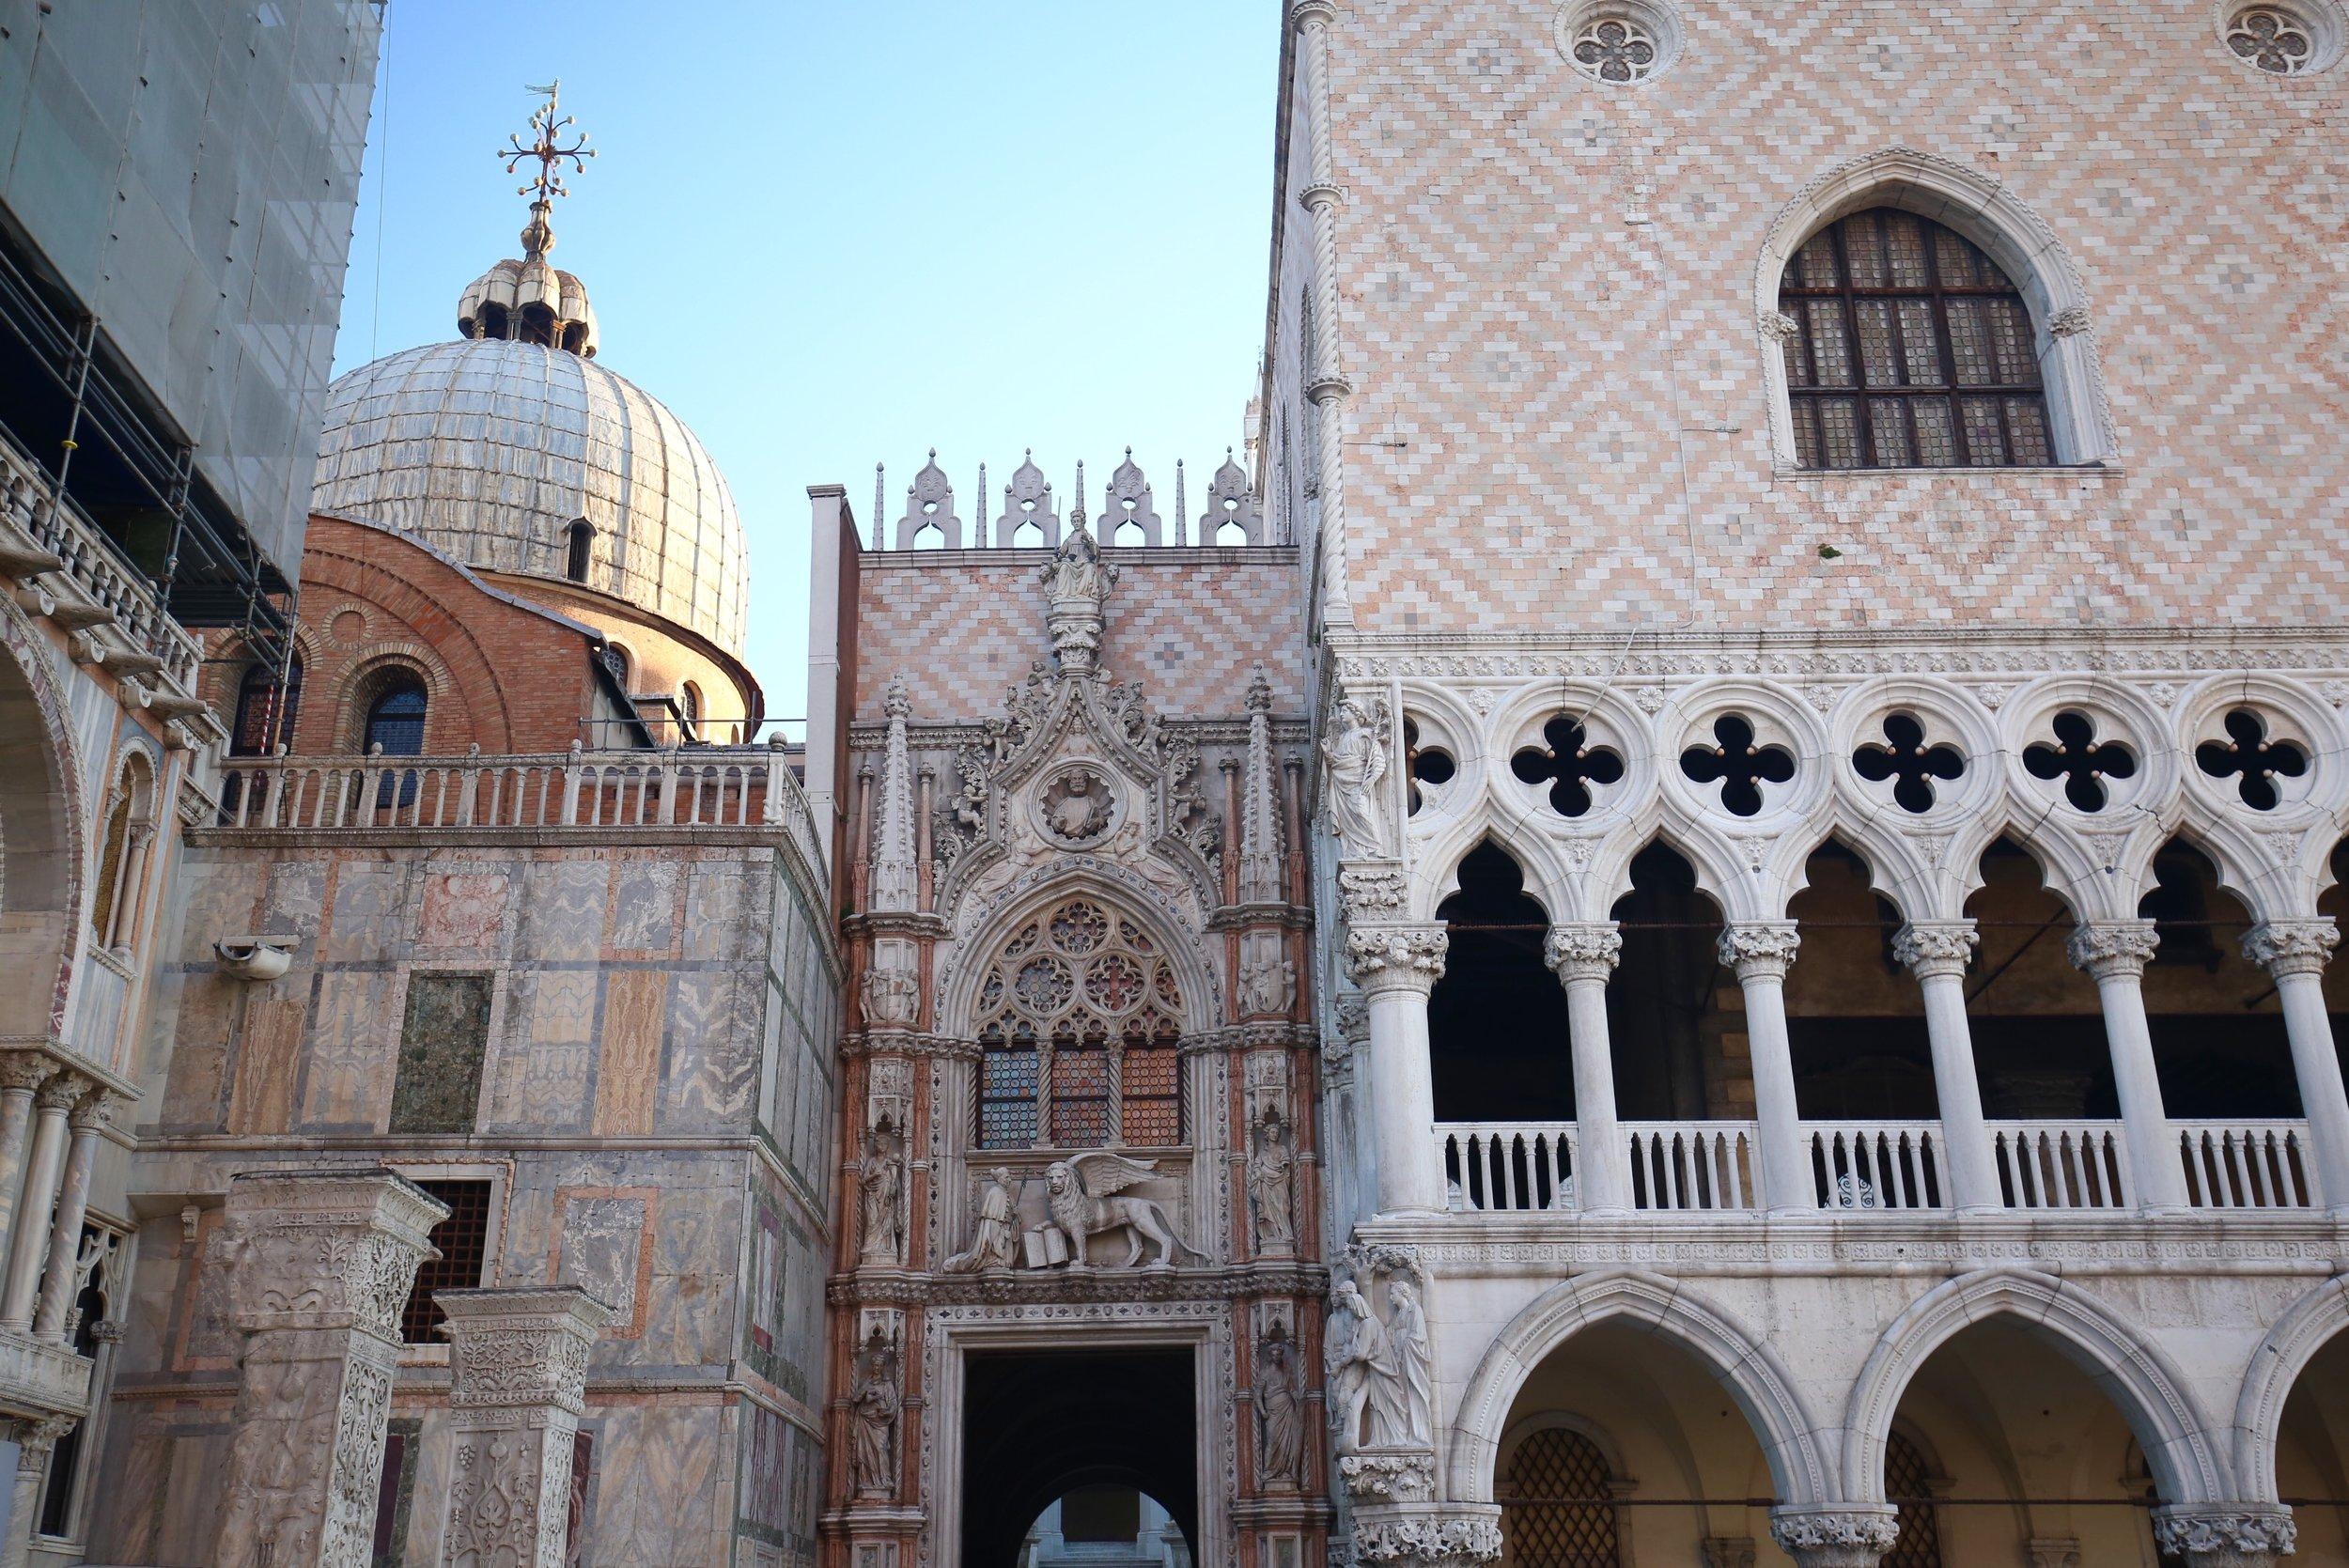 Pink stone architecture in Venice.